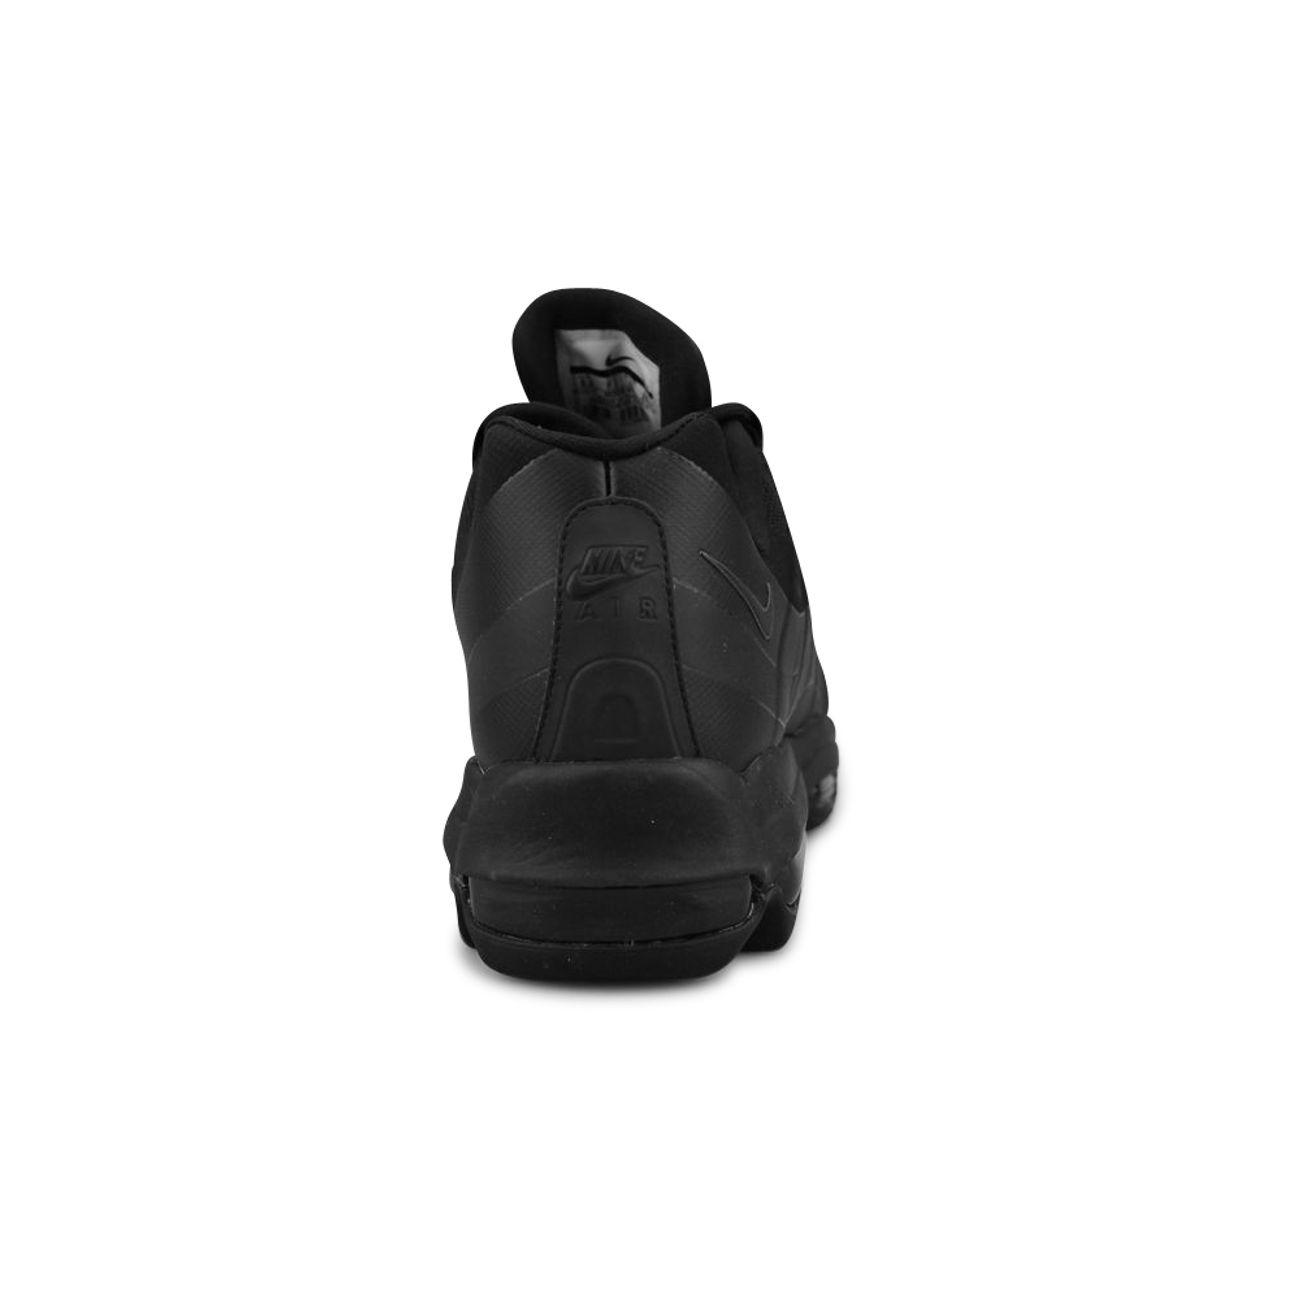 wholesale dealer 29ff3 42645 ... Mode- Lifestyle homme NIKE Basket Nike Air Max 95 Ultra Essential Noir  857910-012